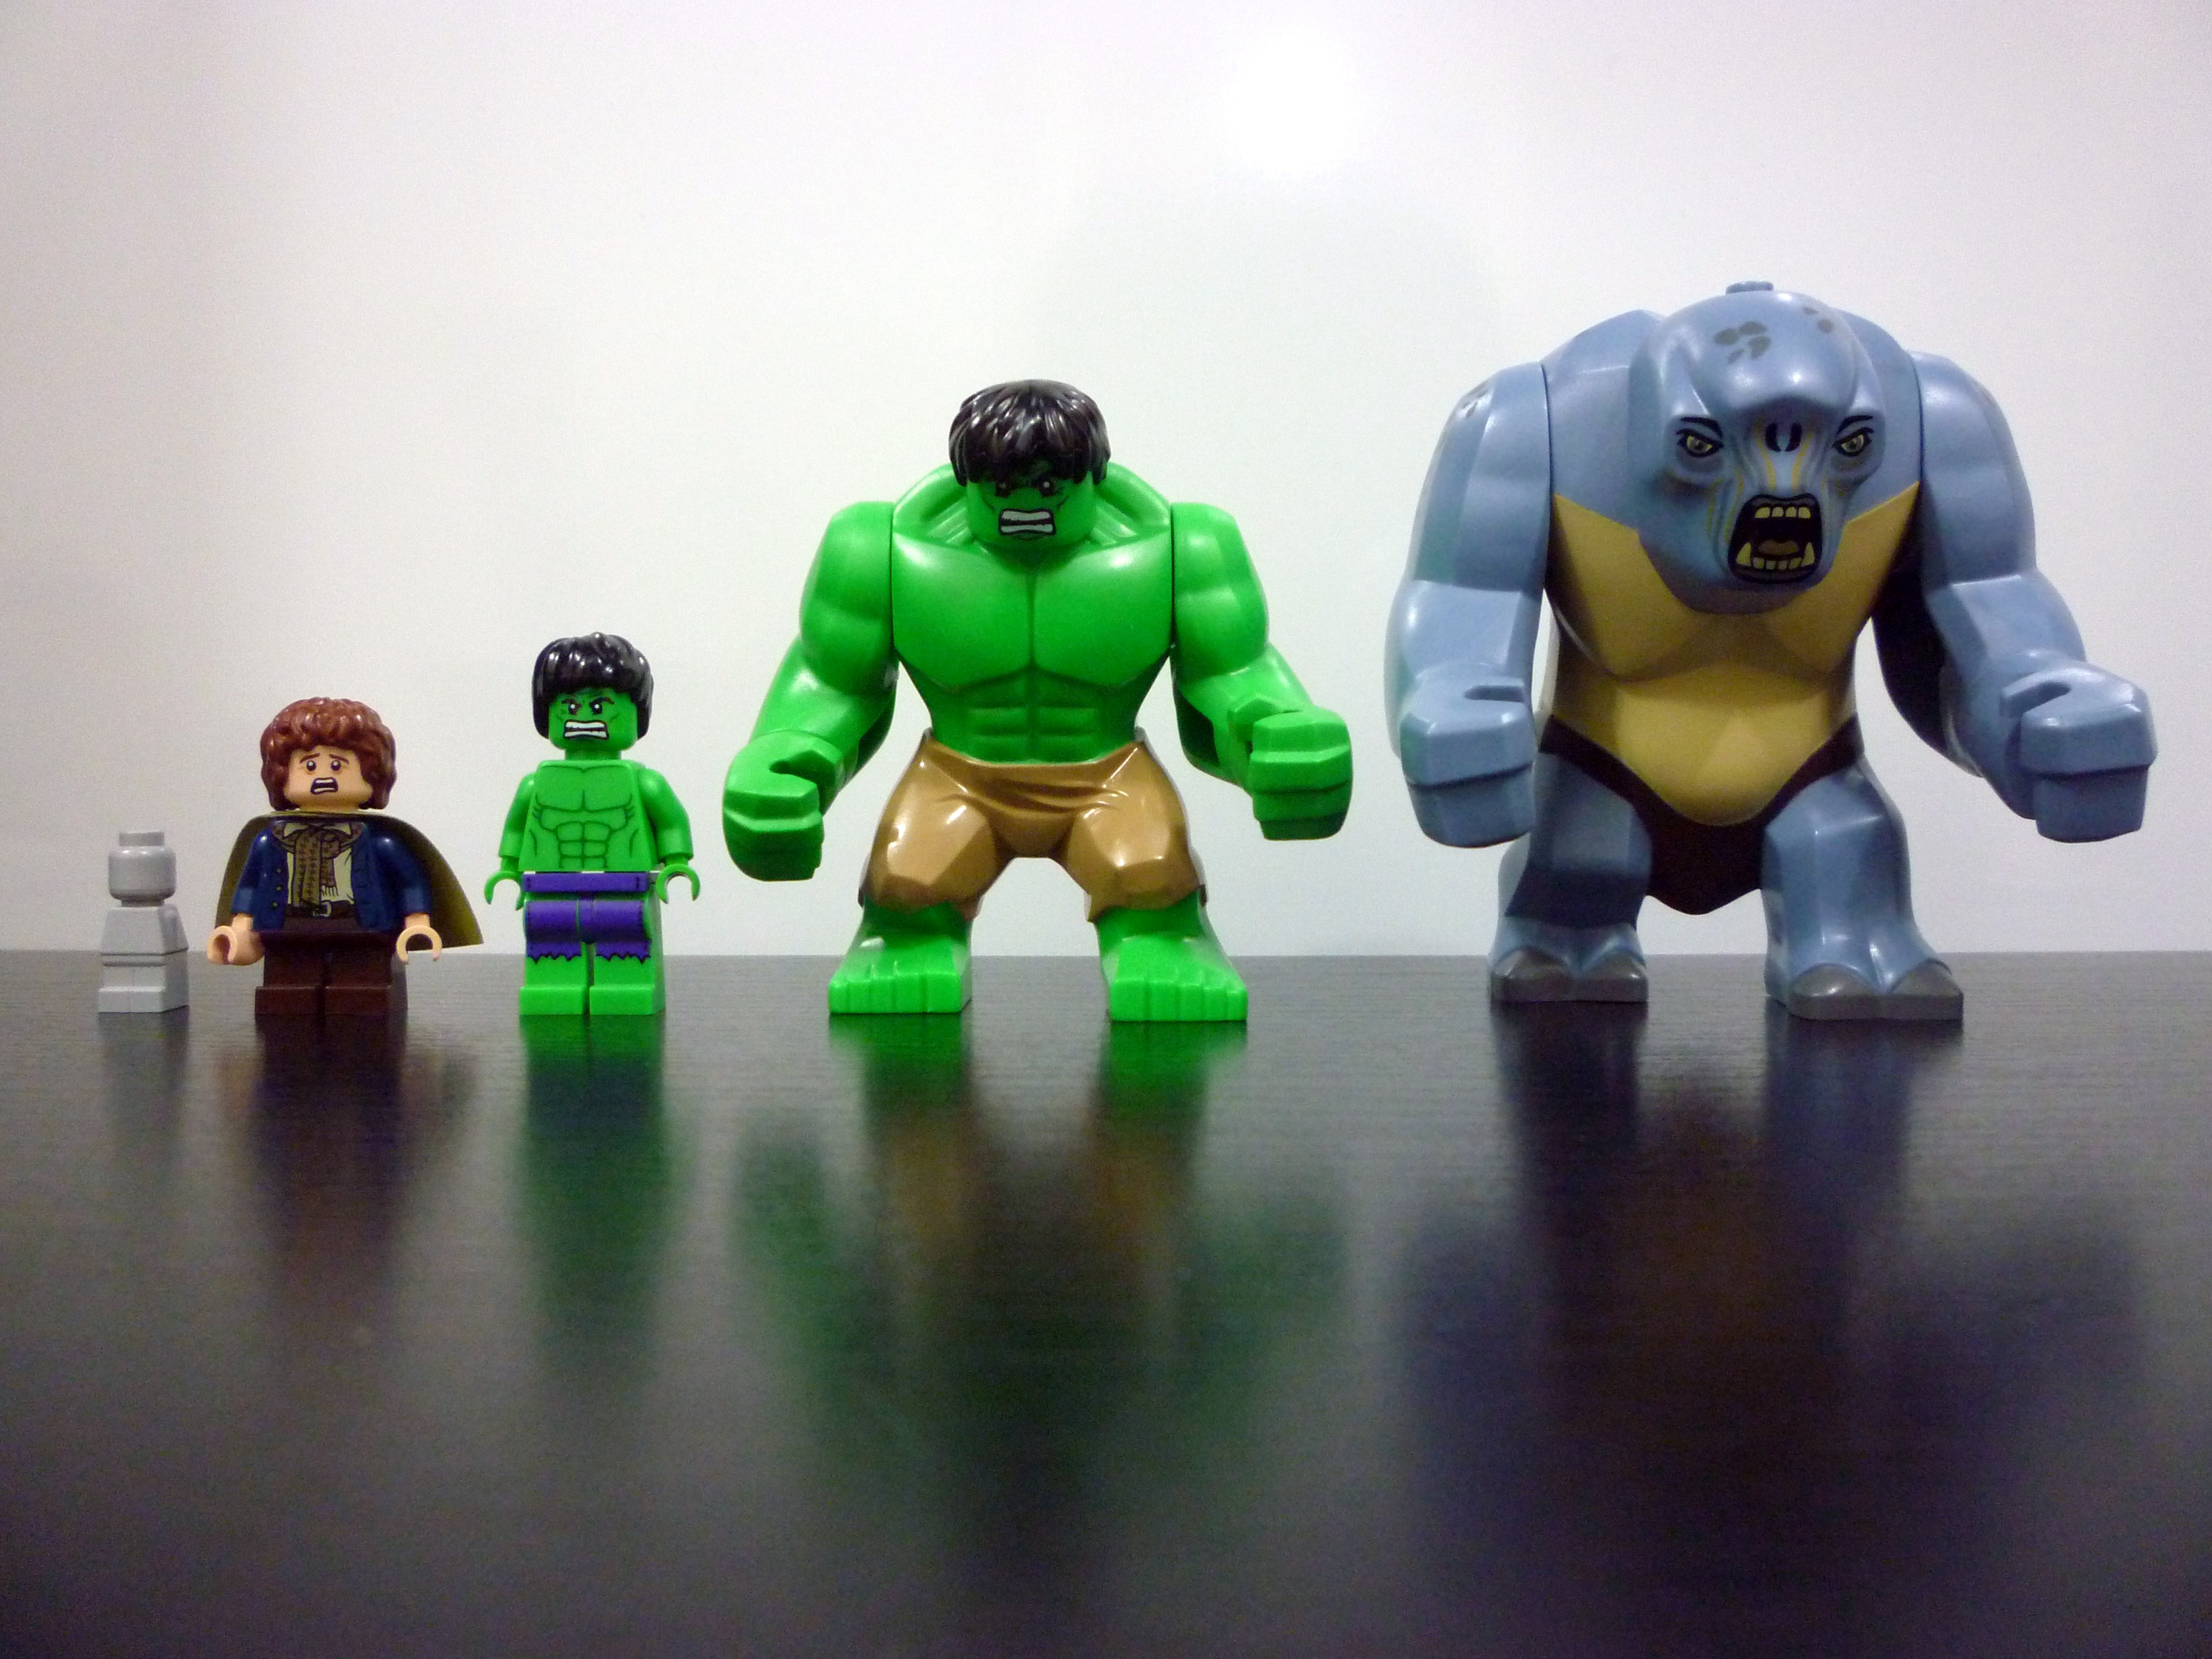 lego hulk vs lego cave troll - photo #9